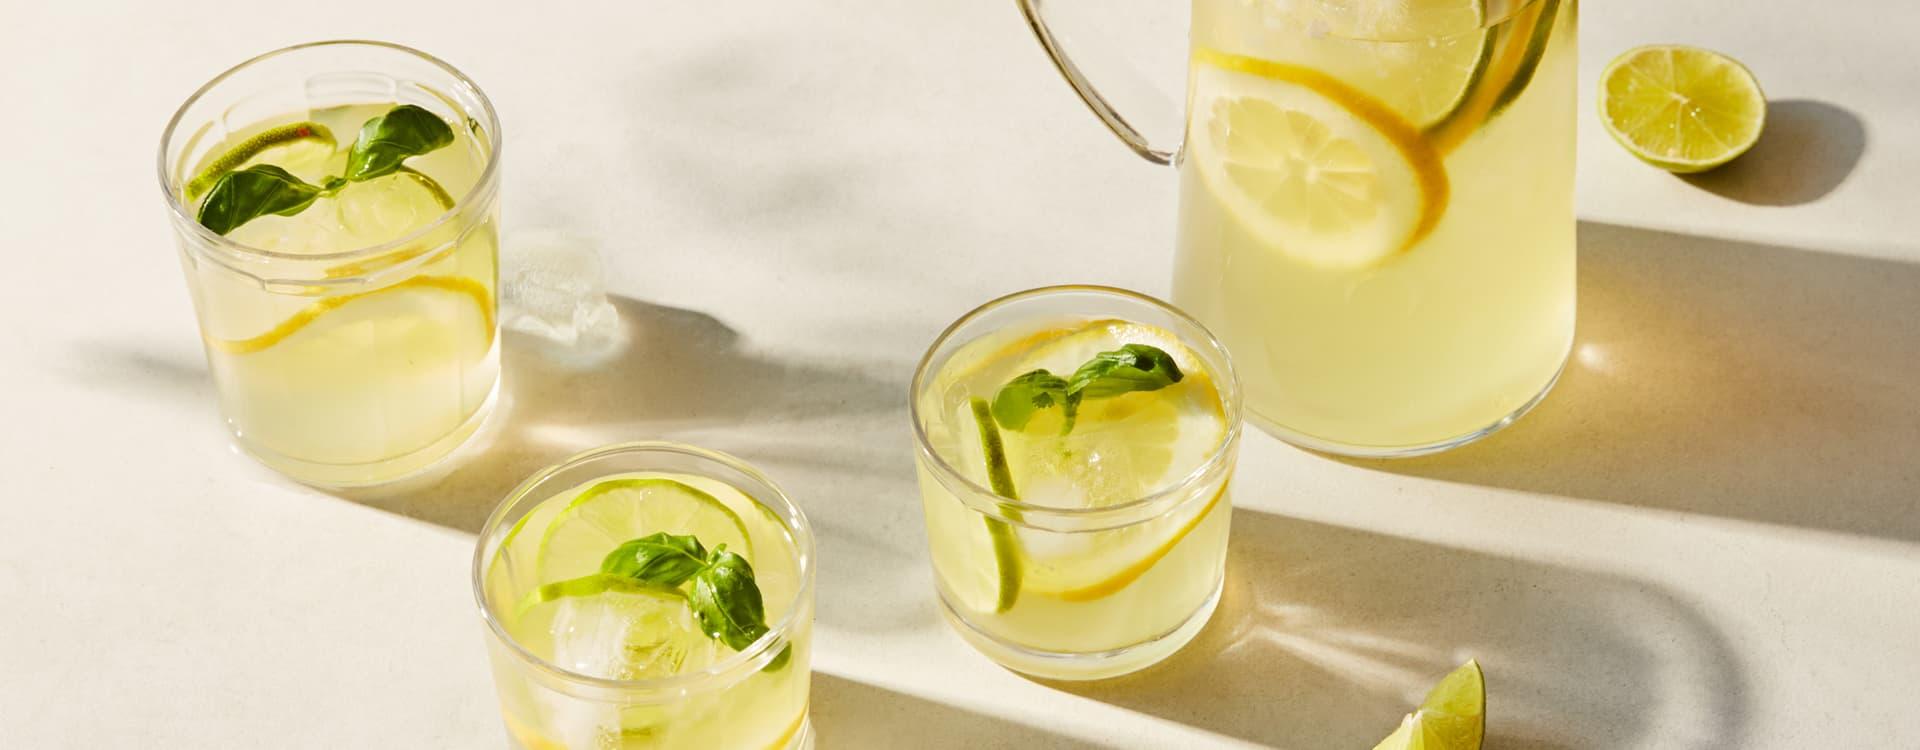 Limonade med basilikum